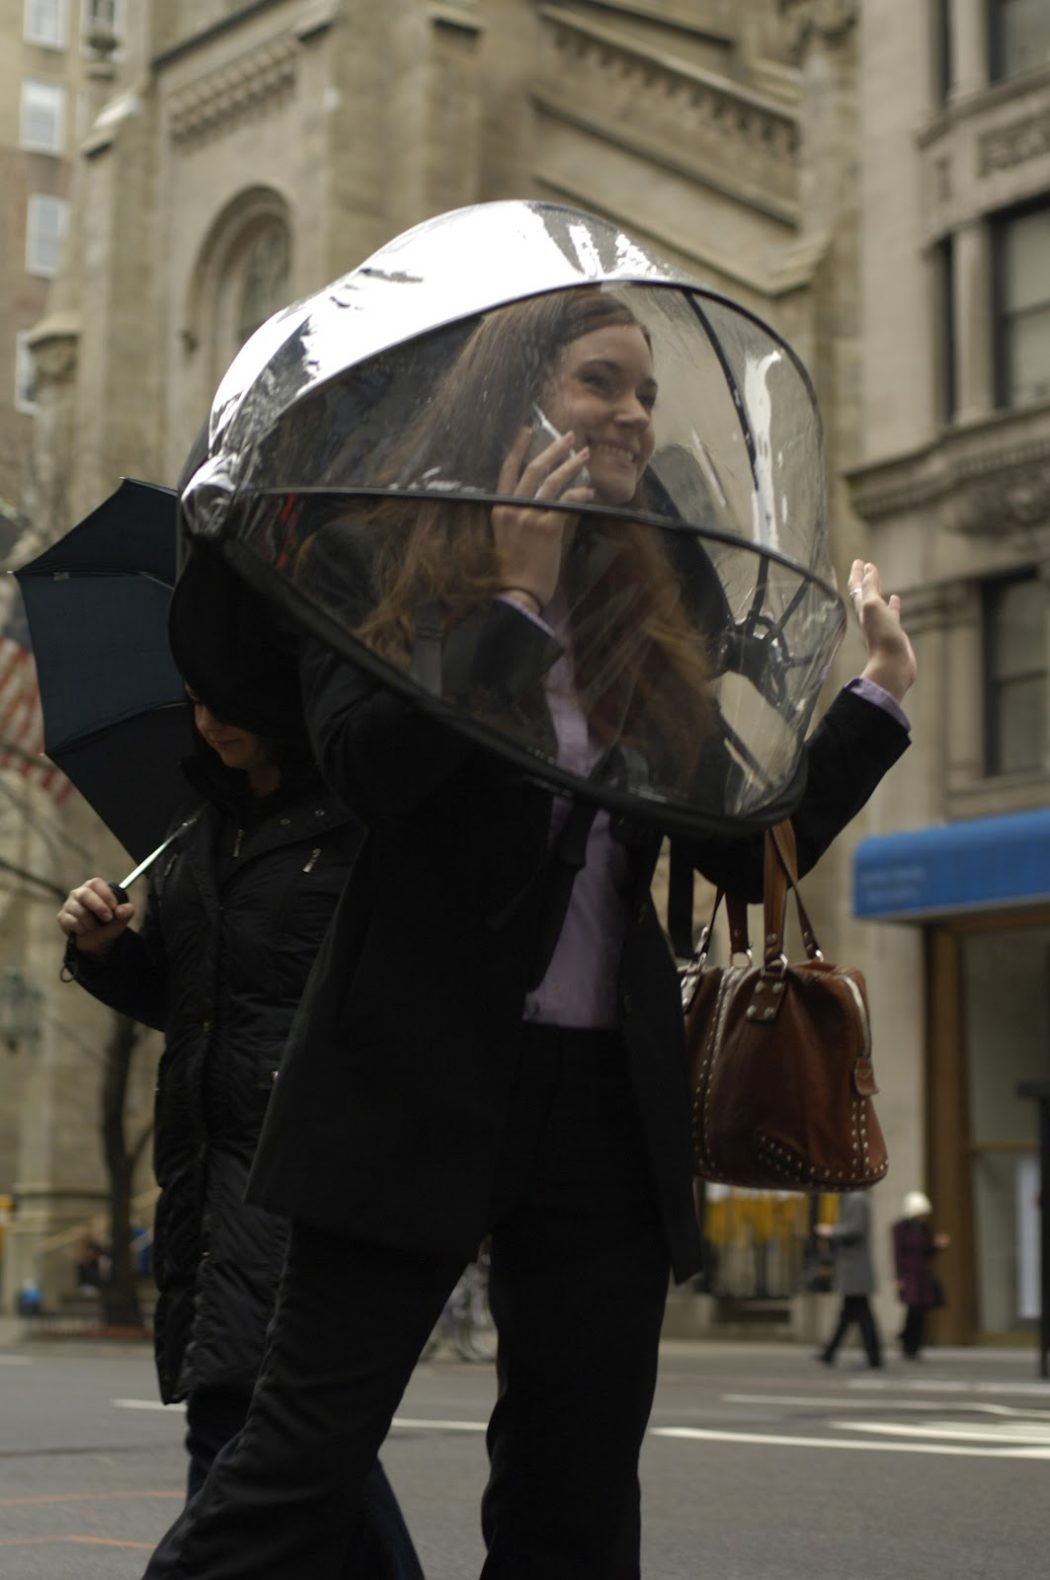 Nubrella3 15 Unusual Umbrellas Design Trends in 2017